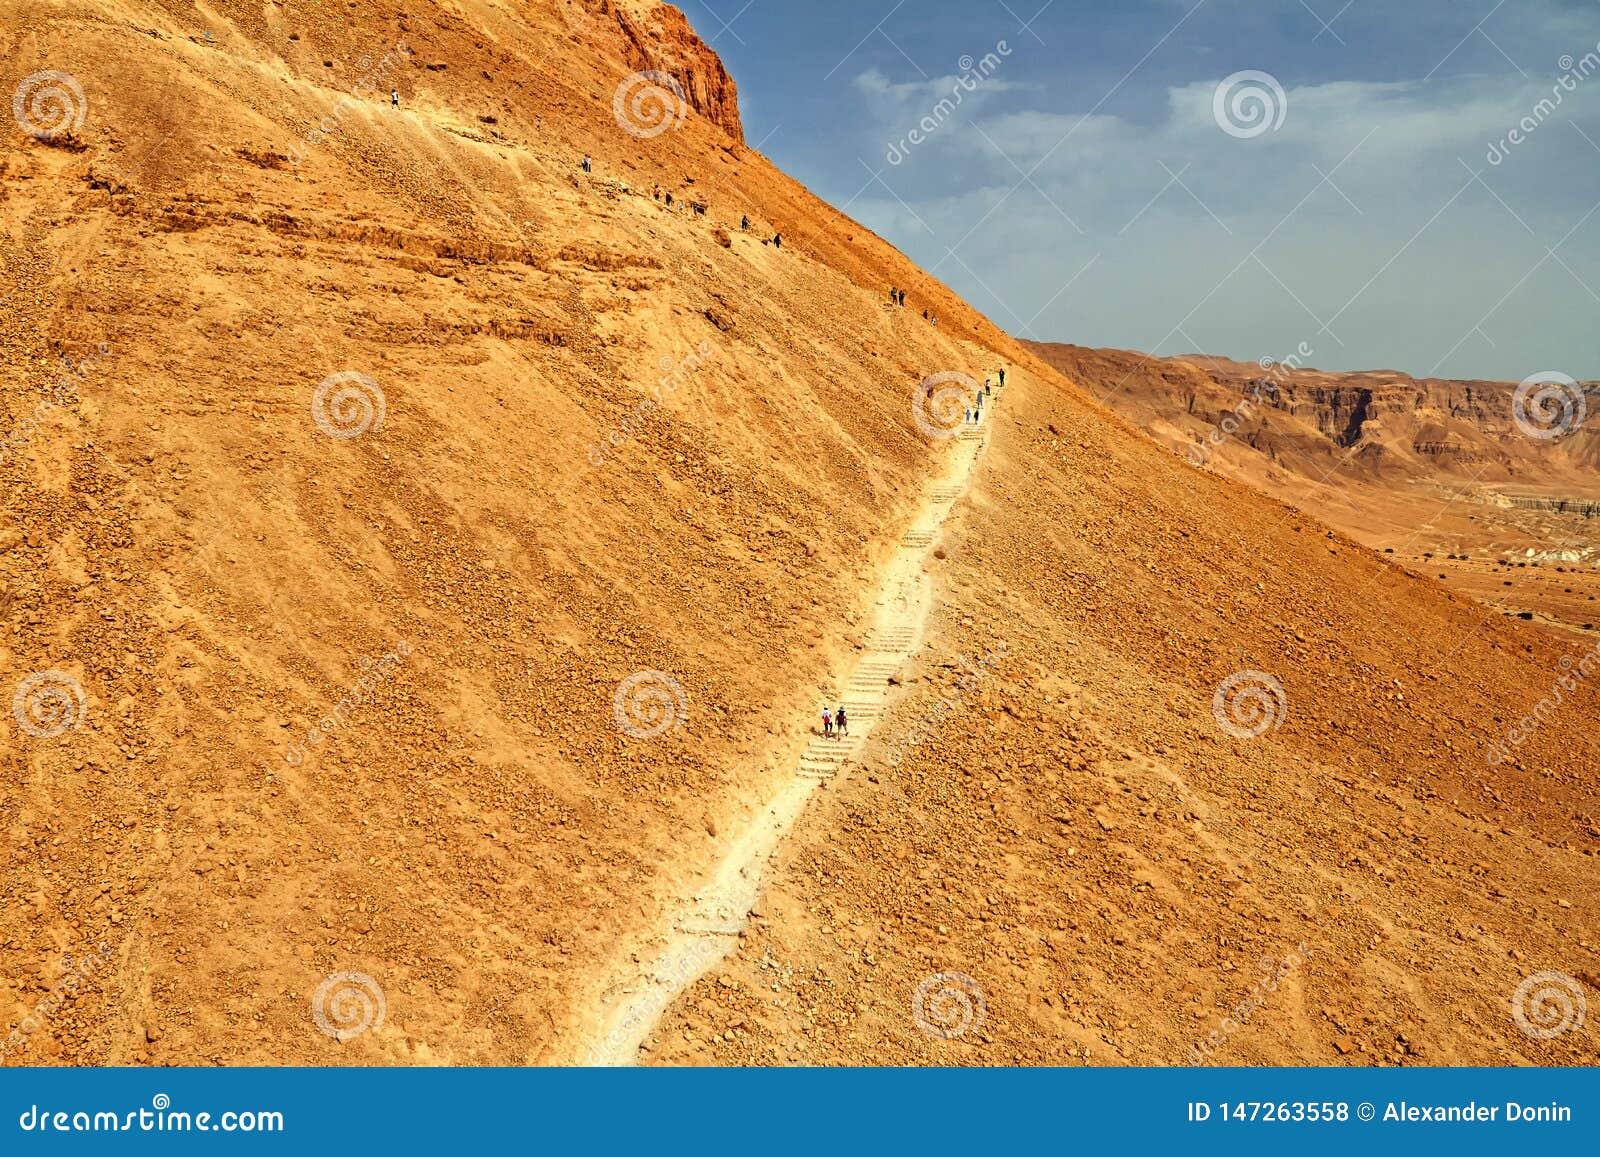 Scenic view of Masada mount in Judean desert